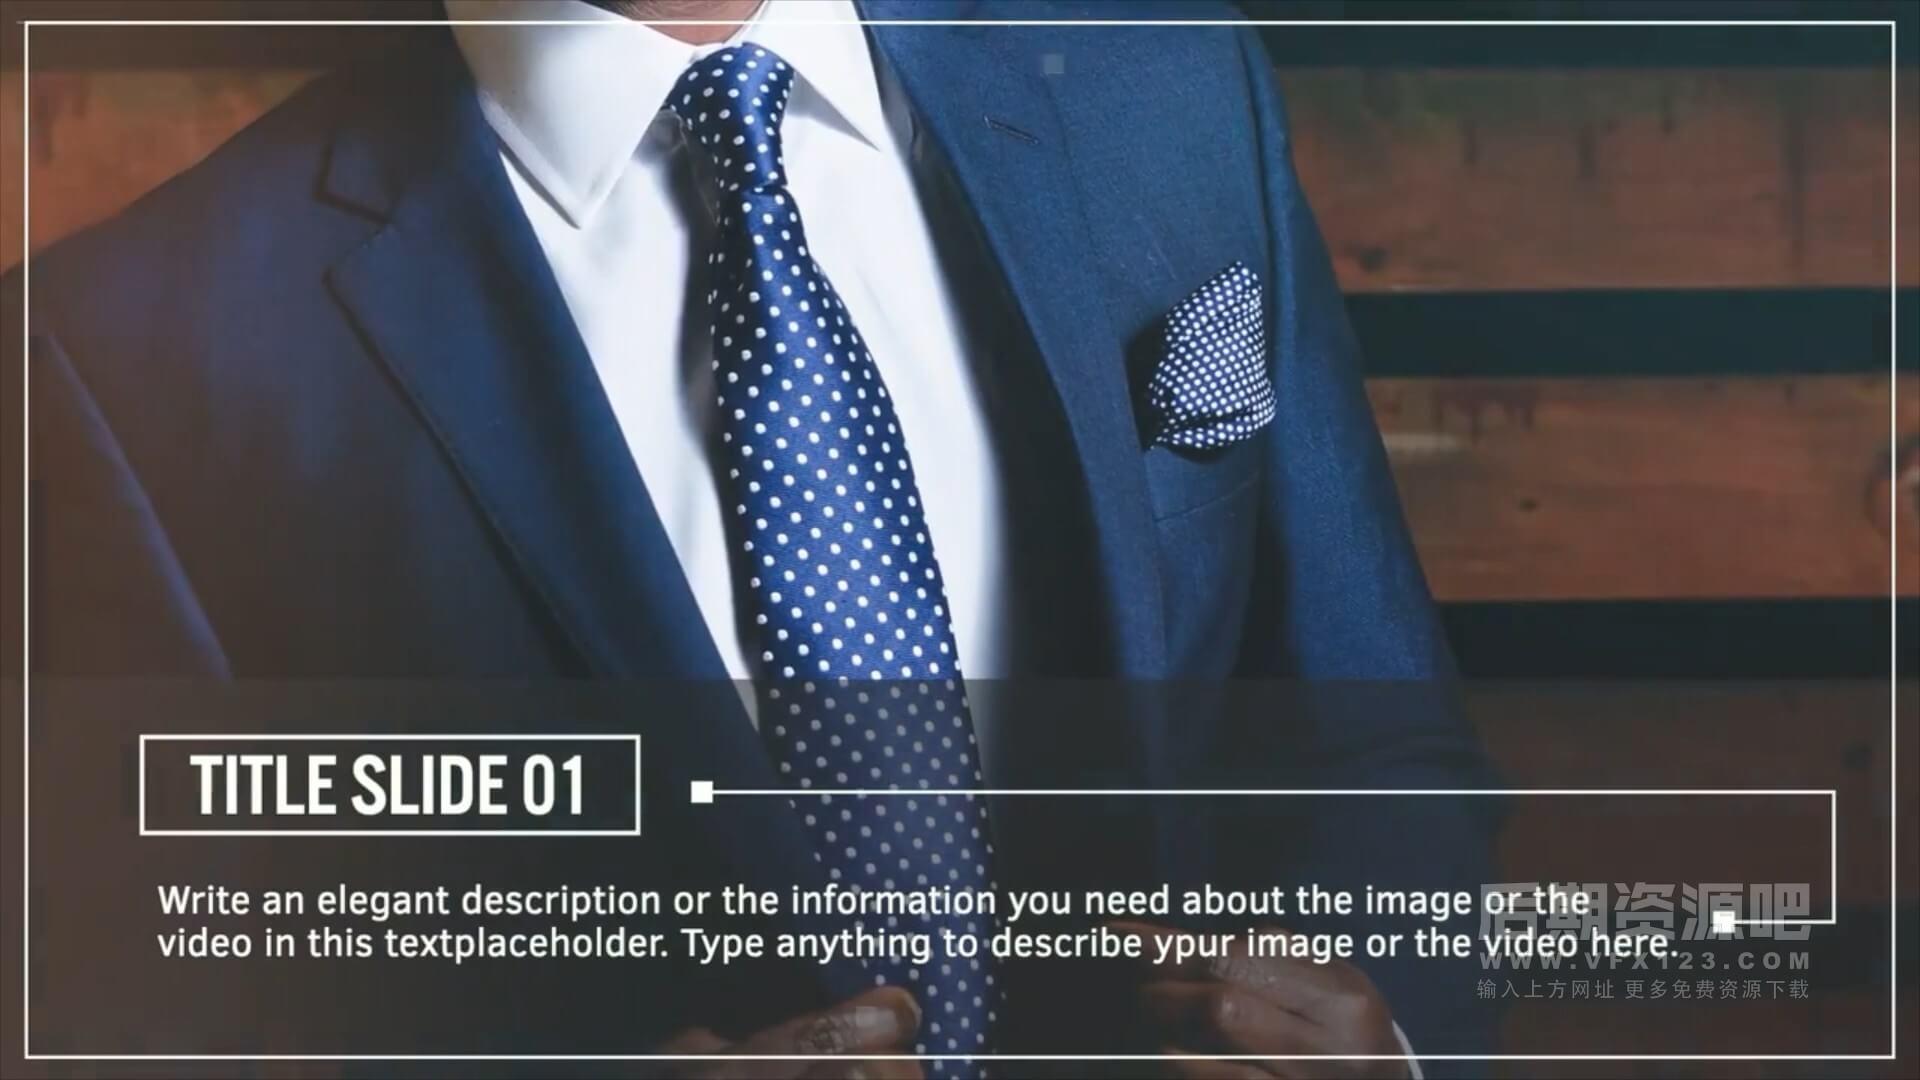 fcpx插件 简洁实用大段落说明文字标题版图文展示模板 Minimal Slideshow